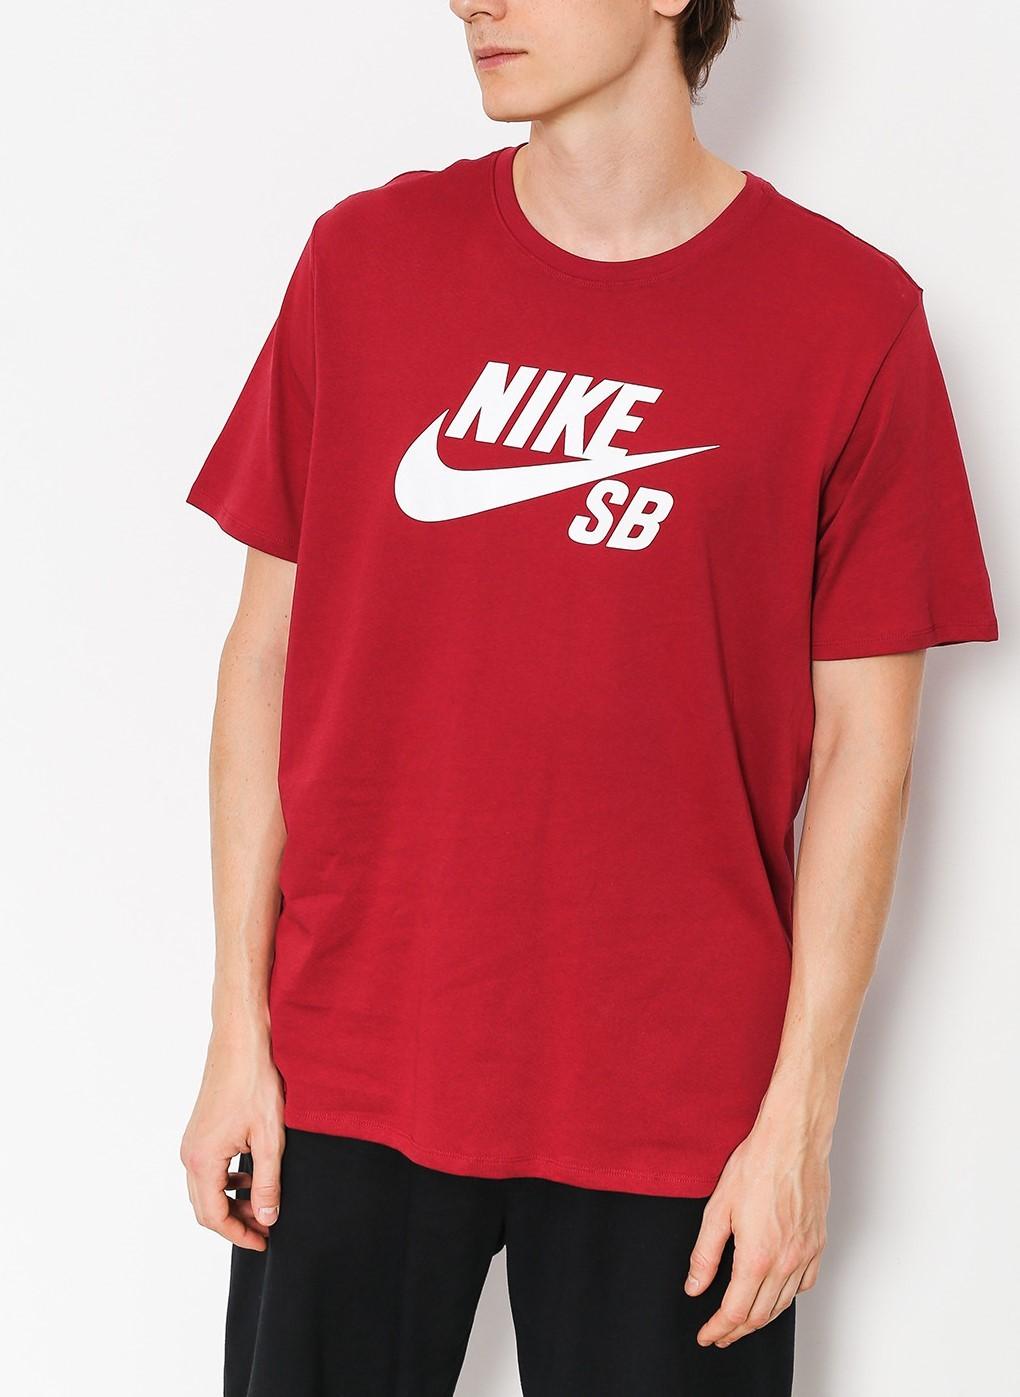 N. Skate Board Kırmızı T Shirt (SNI3)